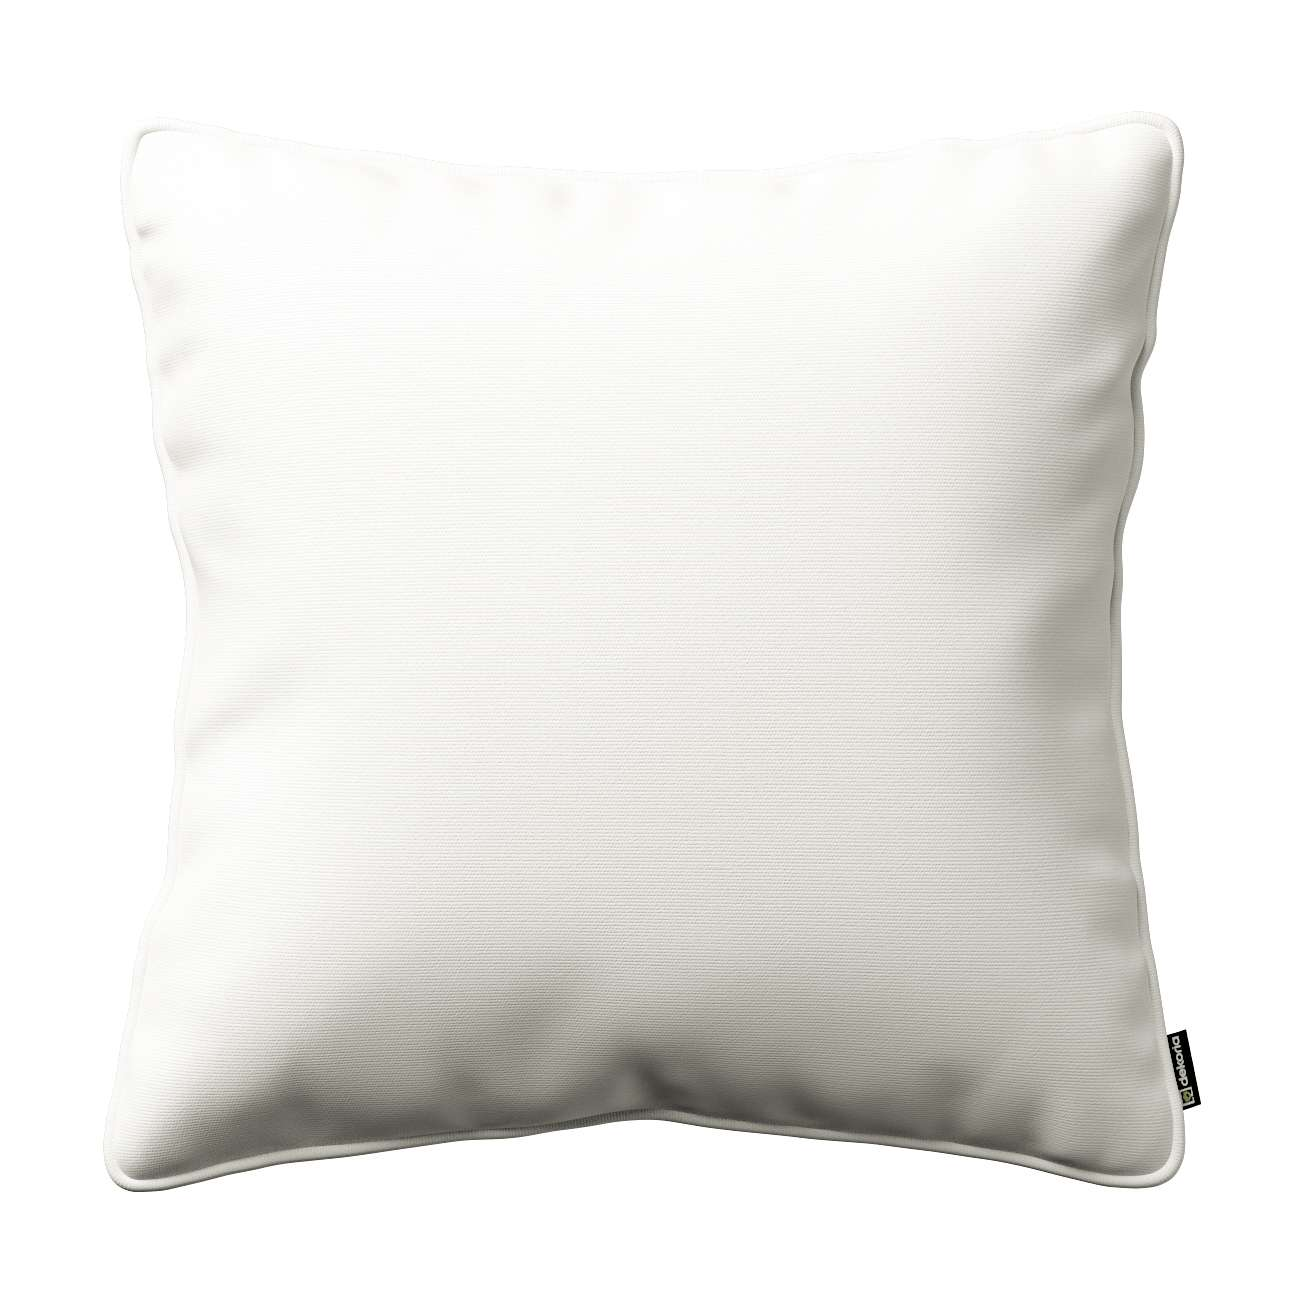 Kissenhülle Gabi mit Paspel 45 x 45 cm von der Kollektion Cotton Panama, Stoff: 702-34